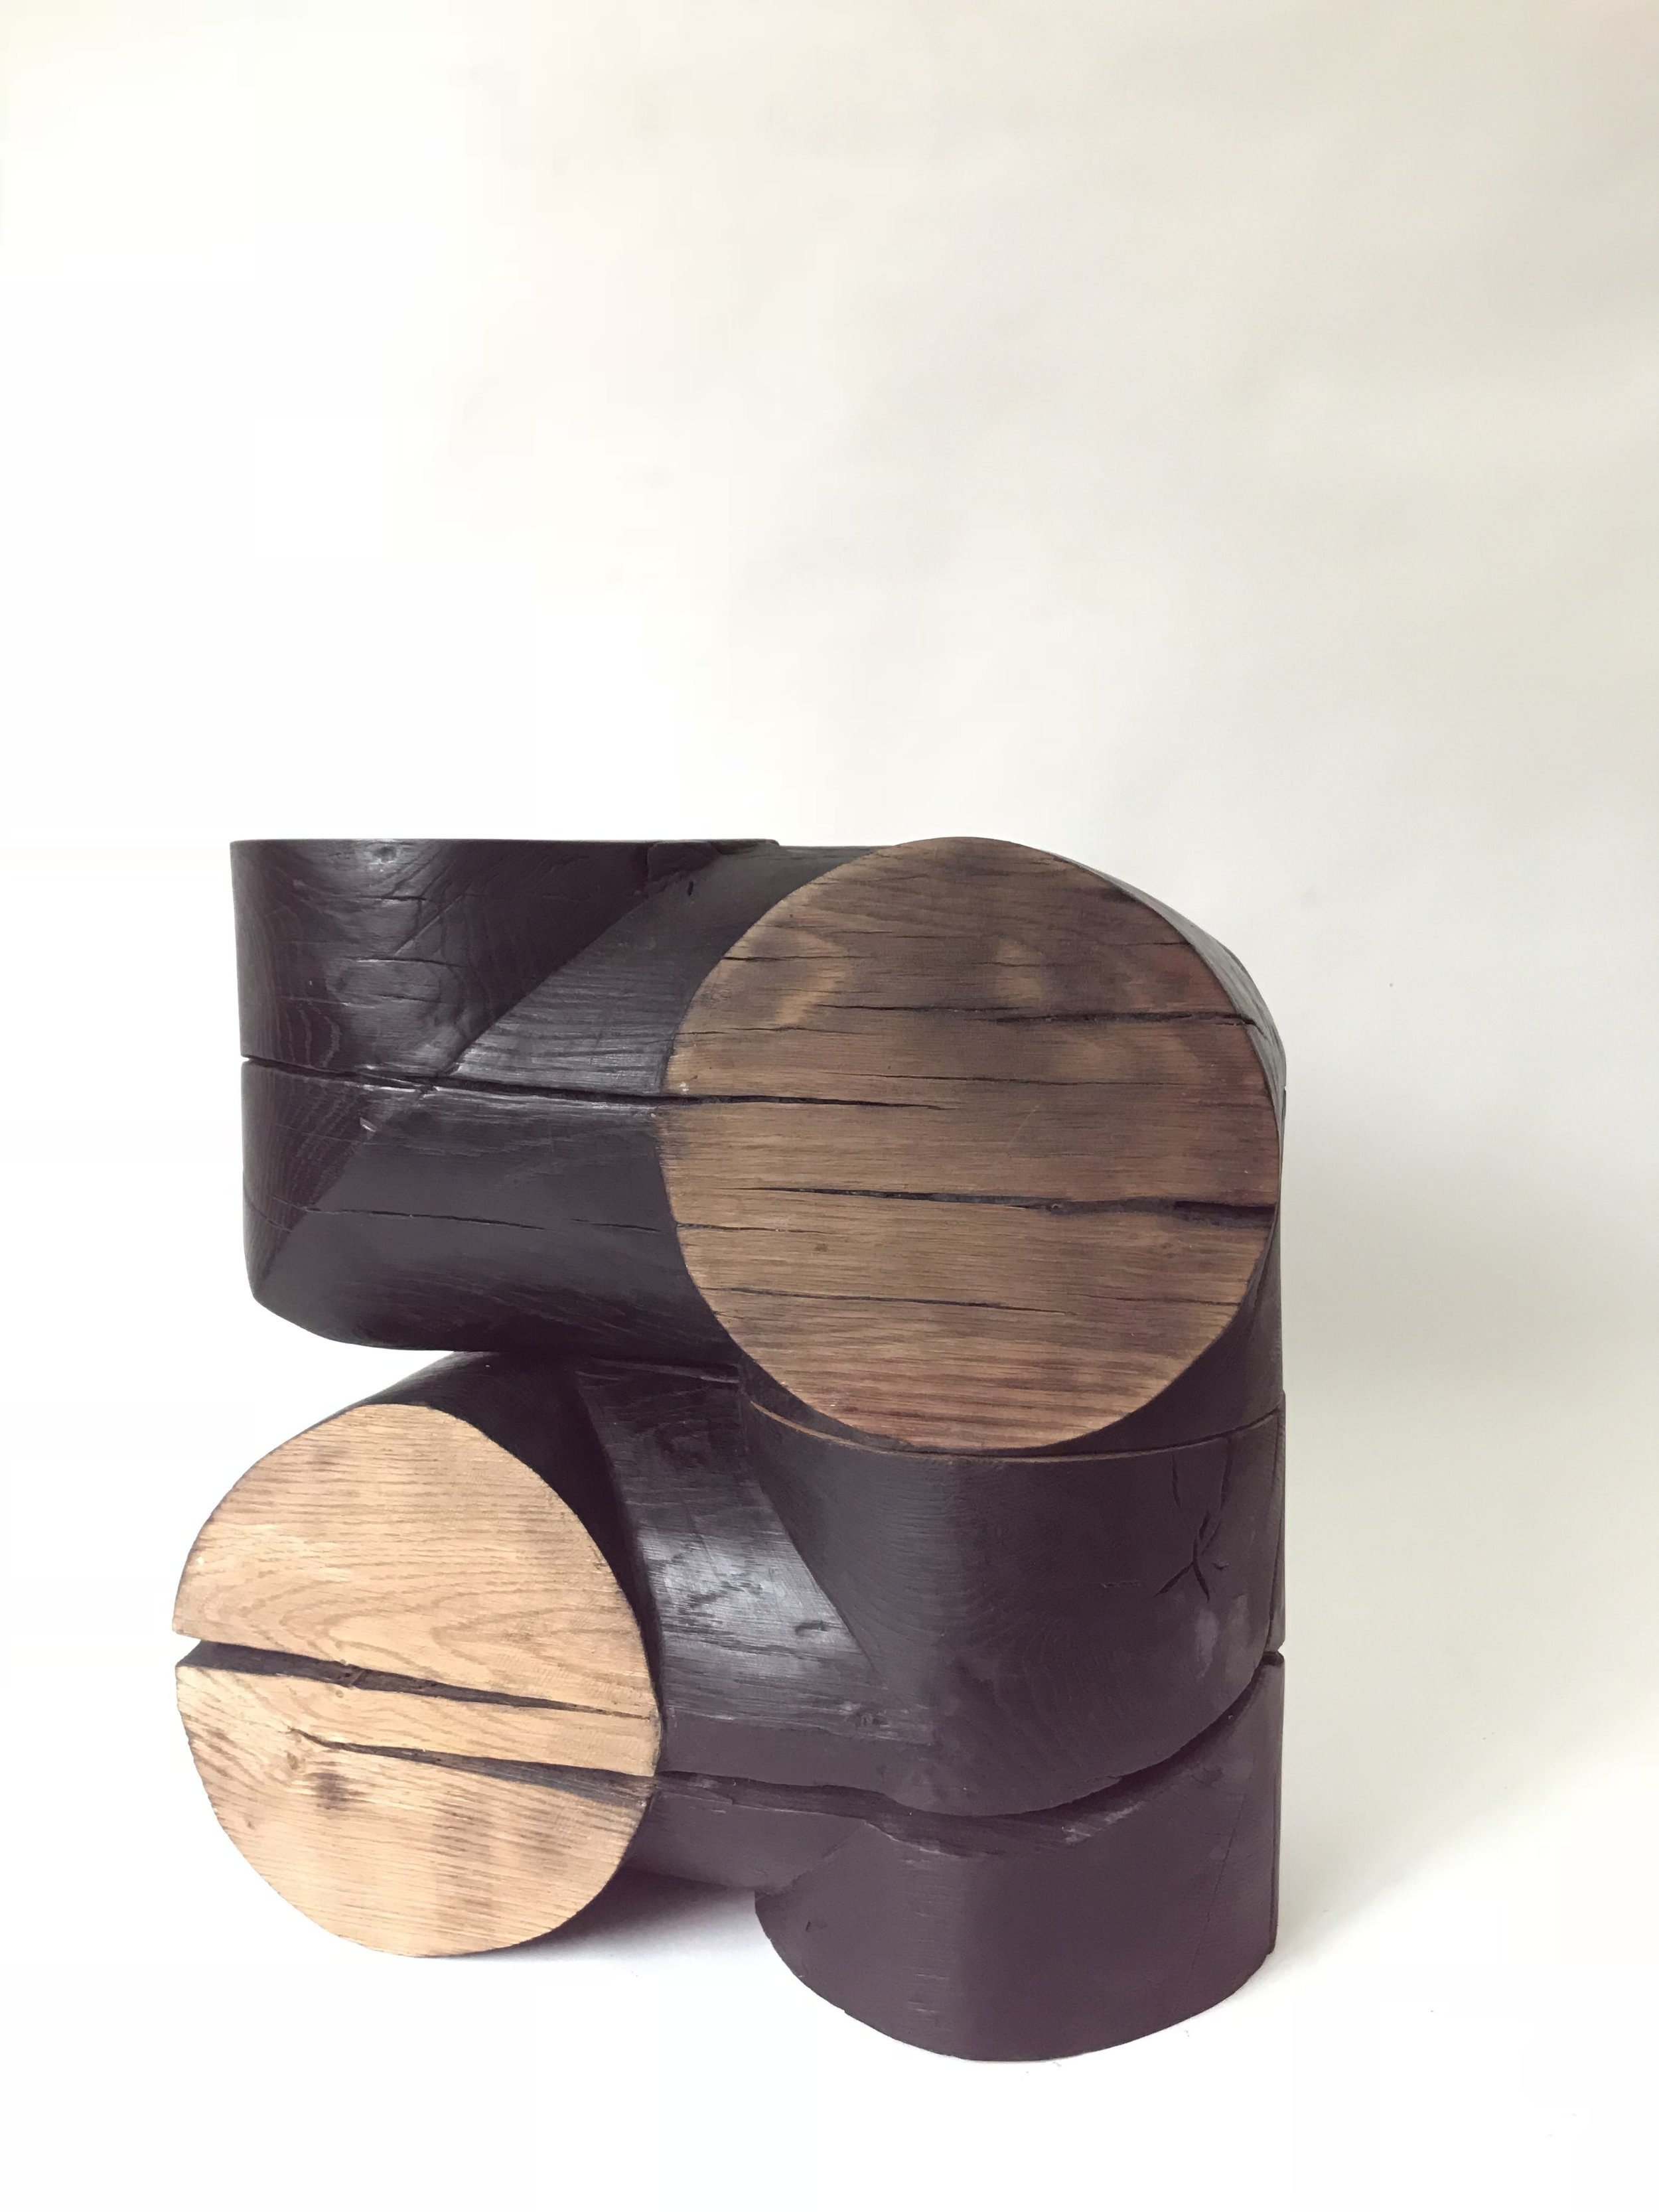 'Abacus II', Burnt wood and wax, 20x20x40cm